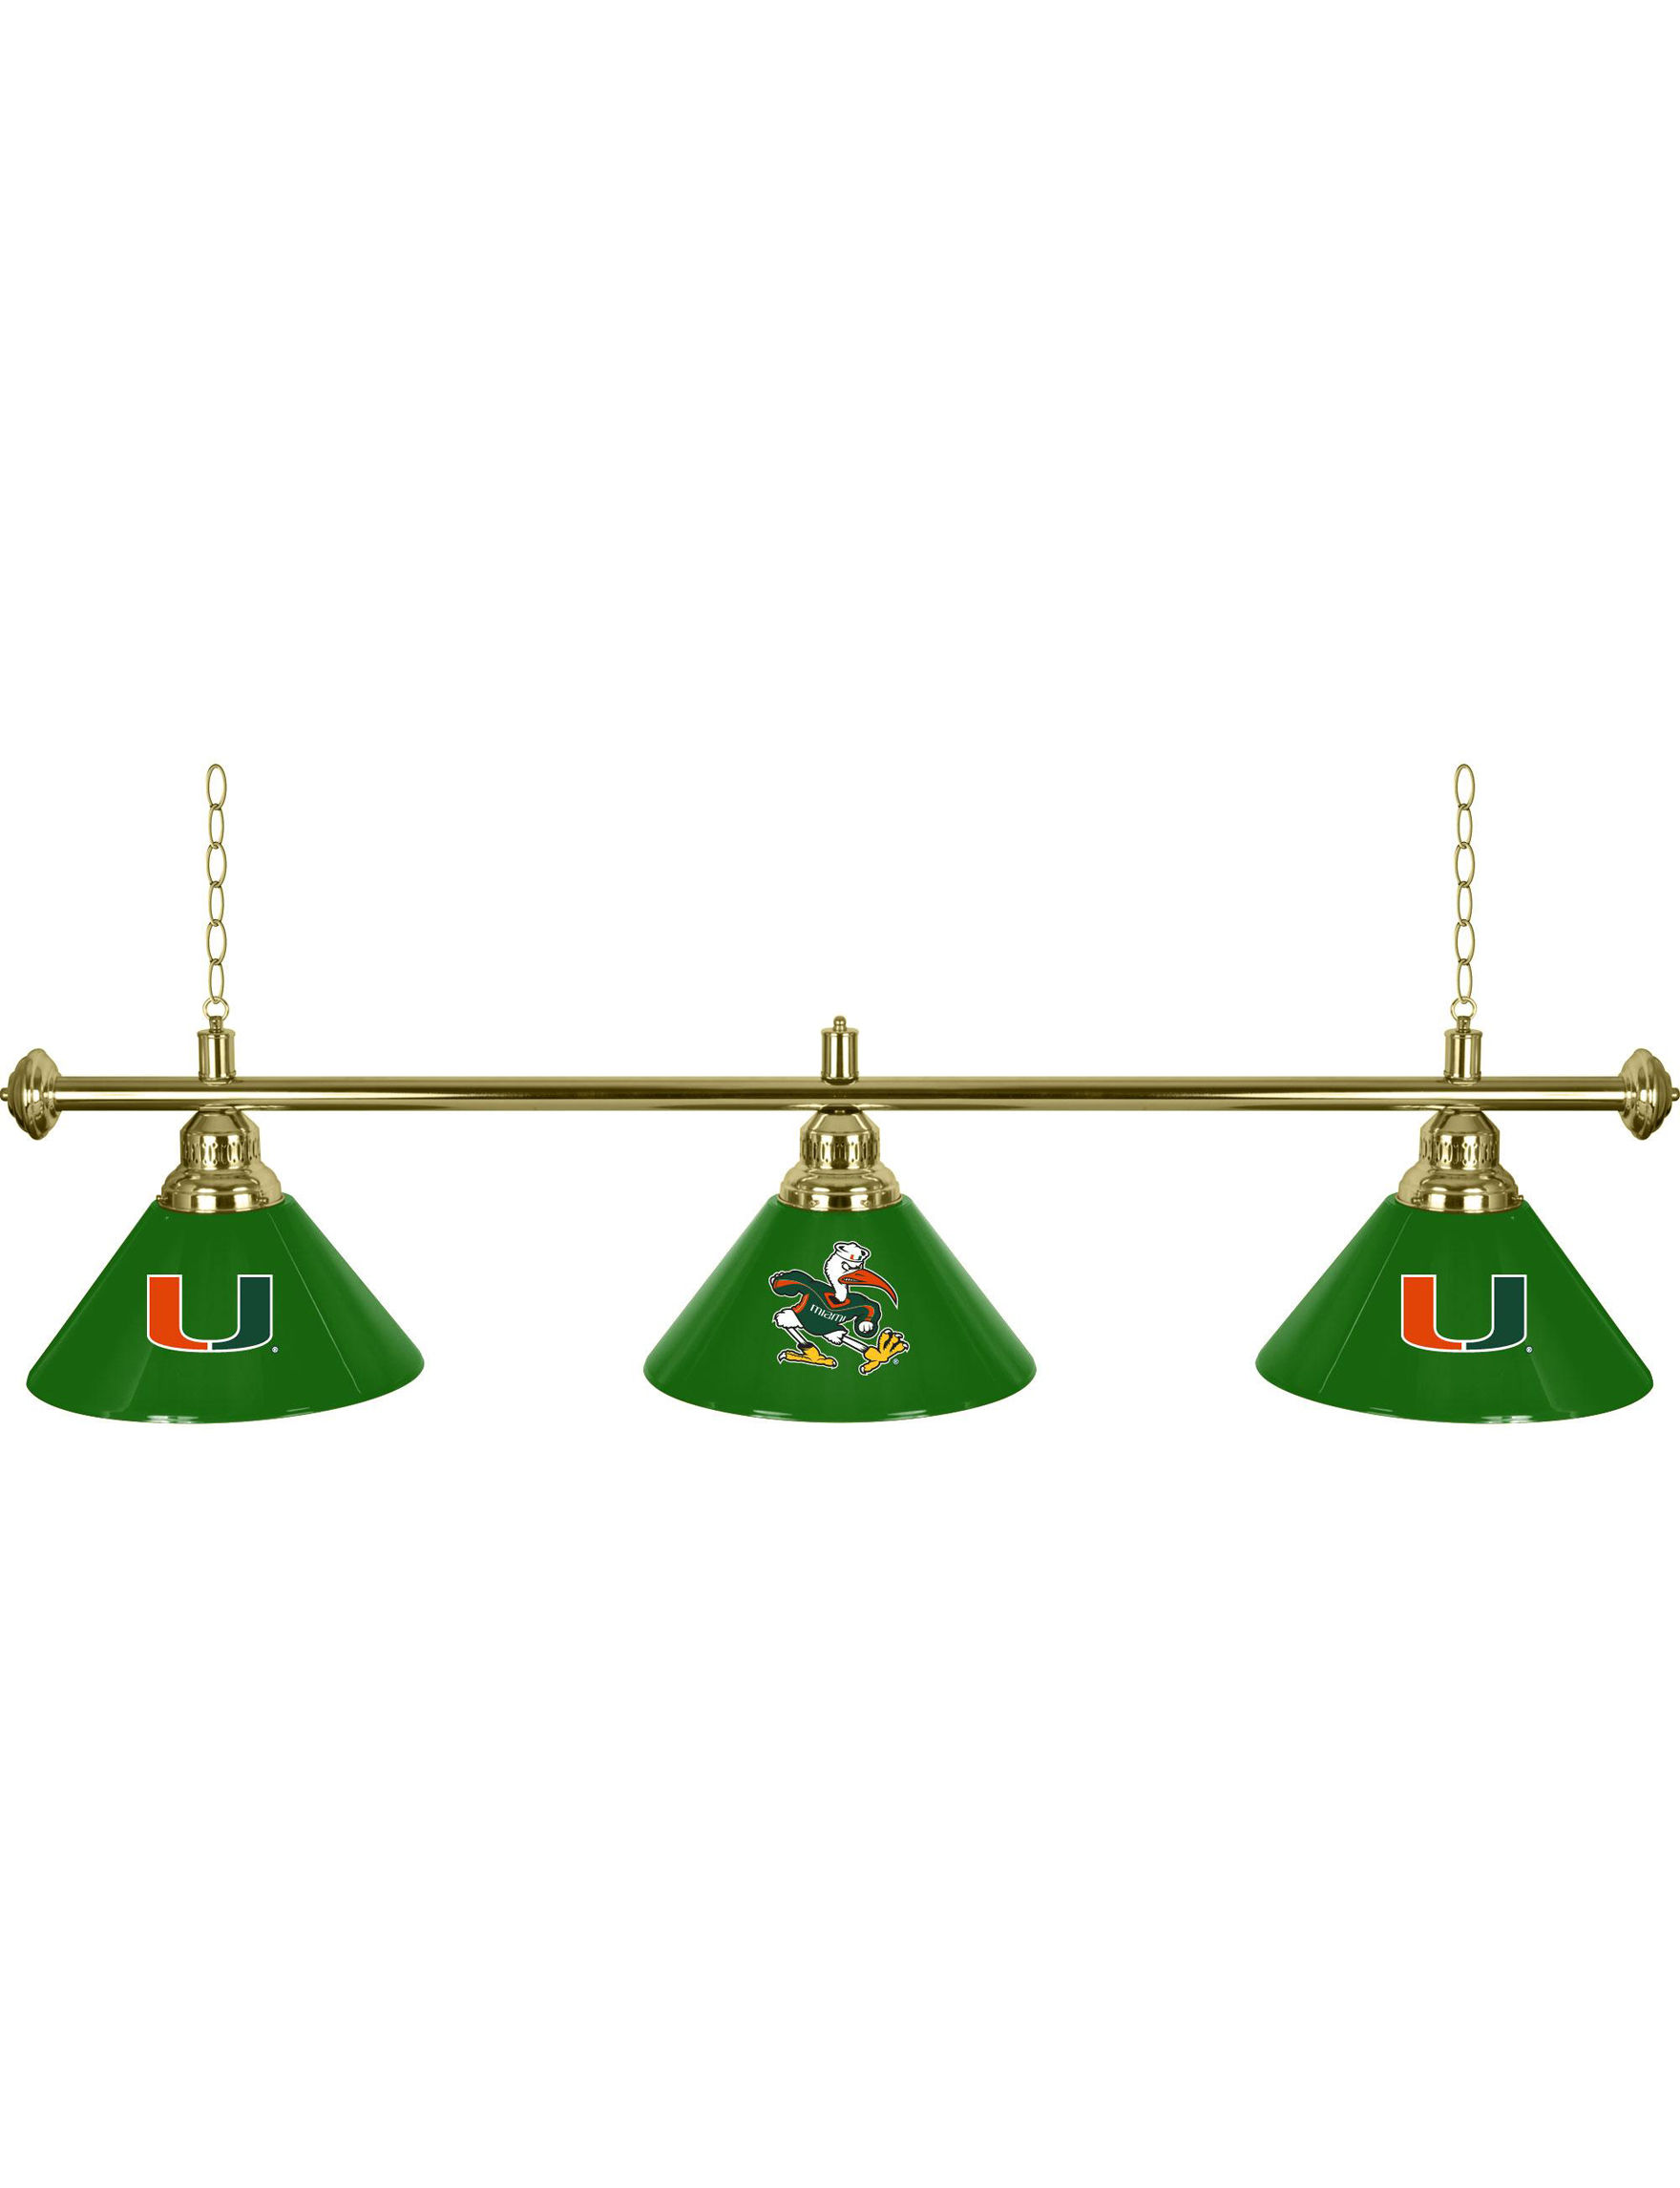 NCAA Green Lighting & Lamps